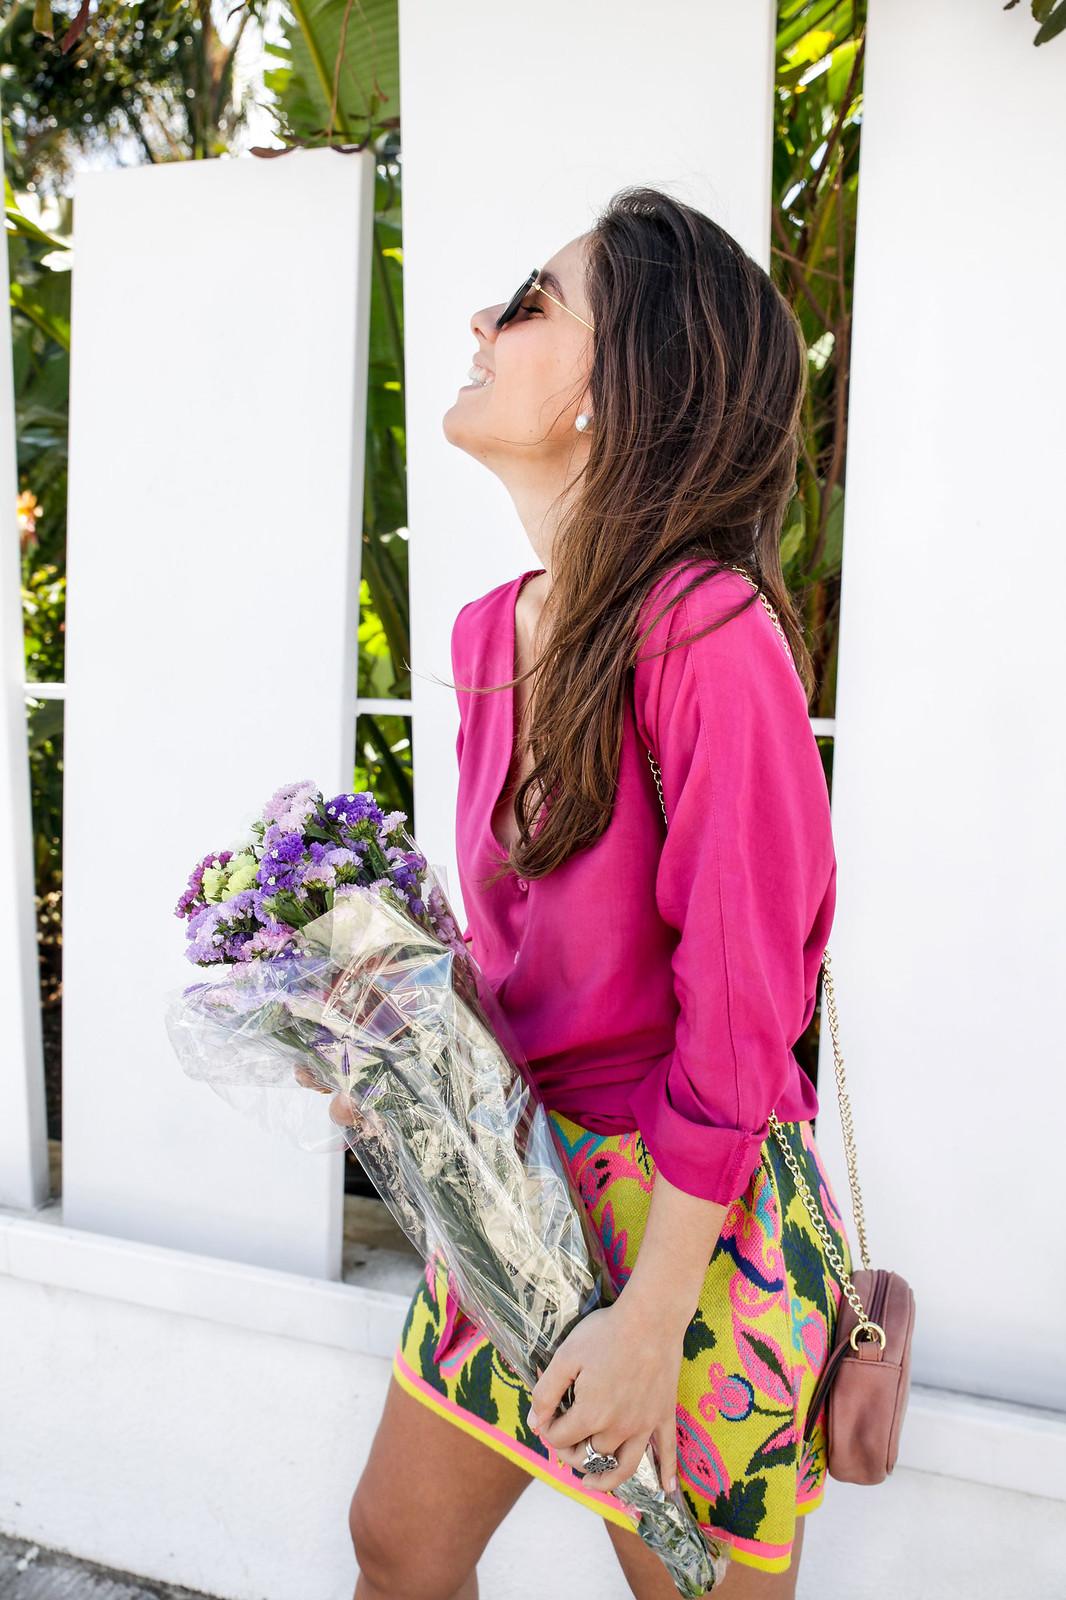 017_blusa_magenta_falda_amarilla_outfit_ruga_summer17_theguestgirl_influencer_barcelona_portugal_brand_ambassador